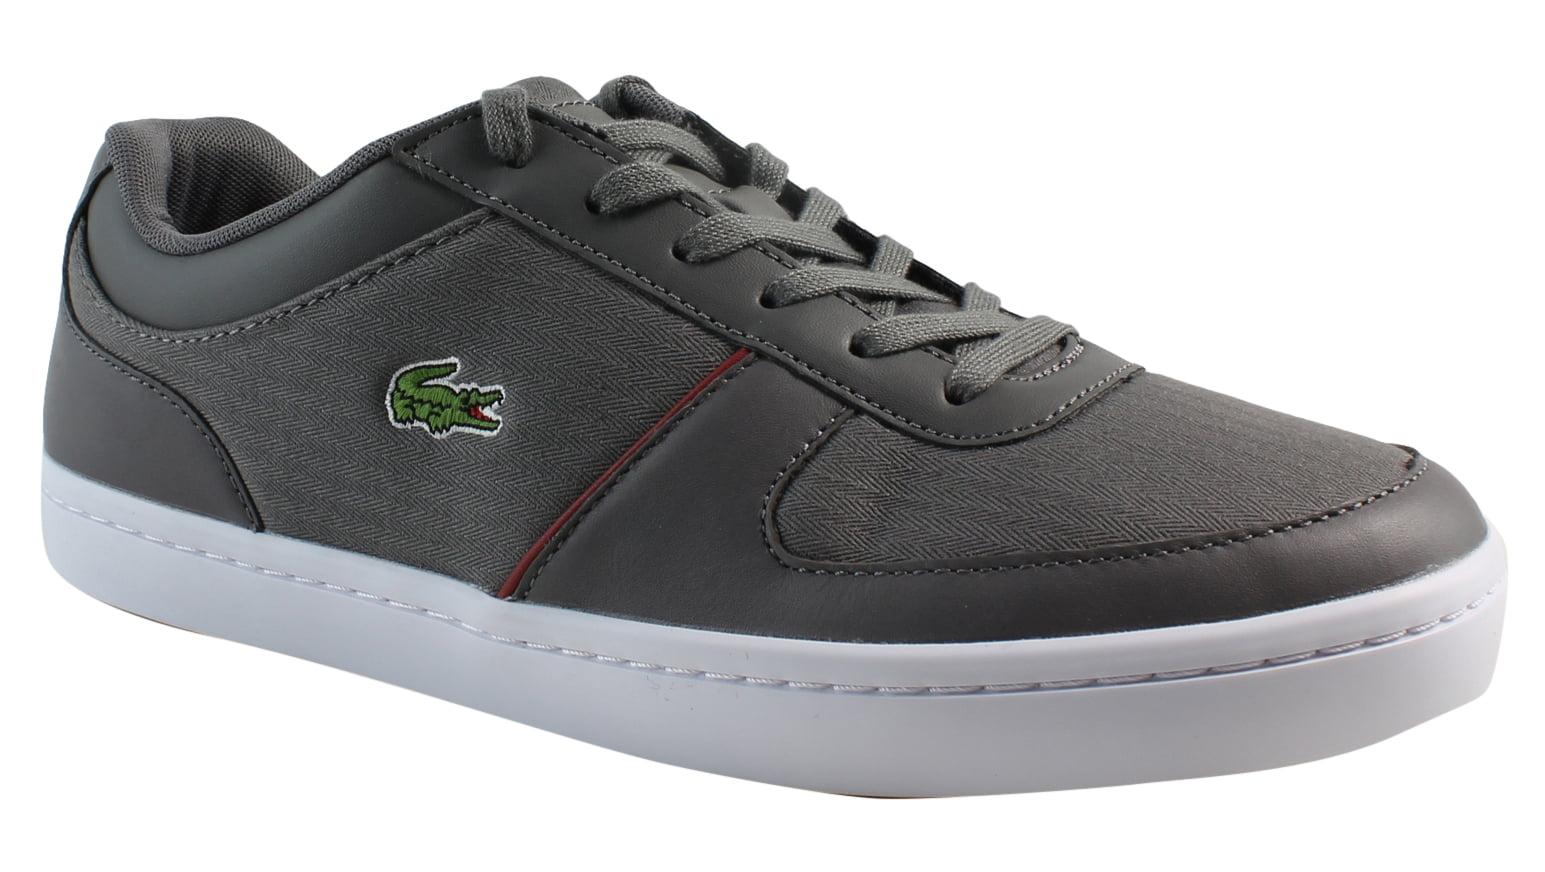 New Lacoste Womens Gripton Gray Fashion Shoes Size 9.5